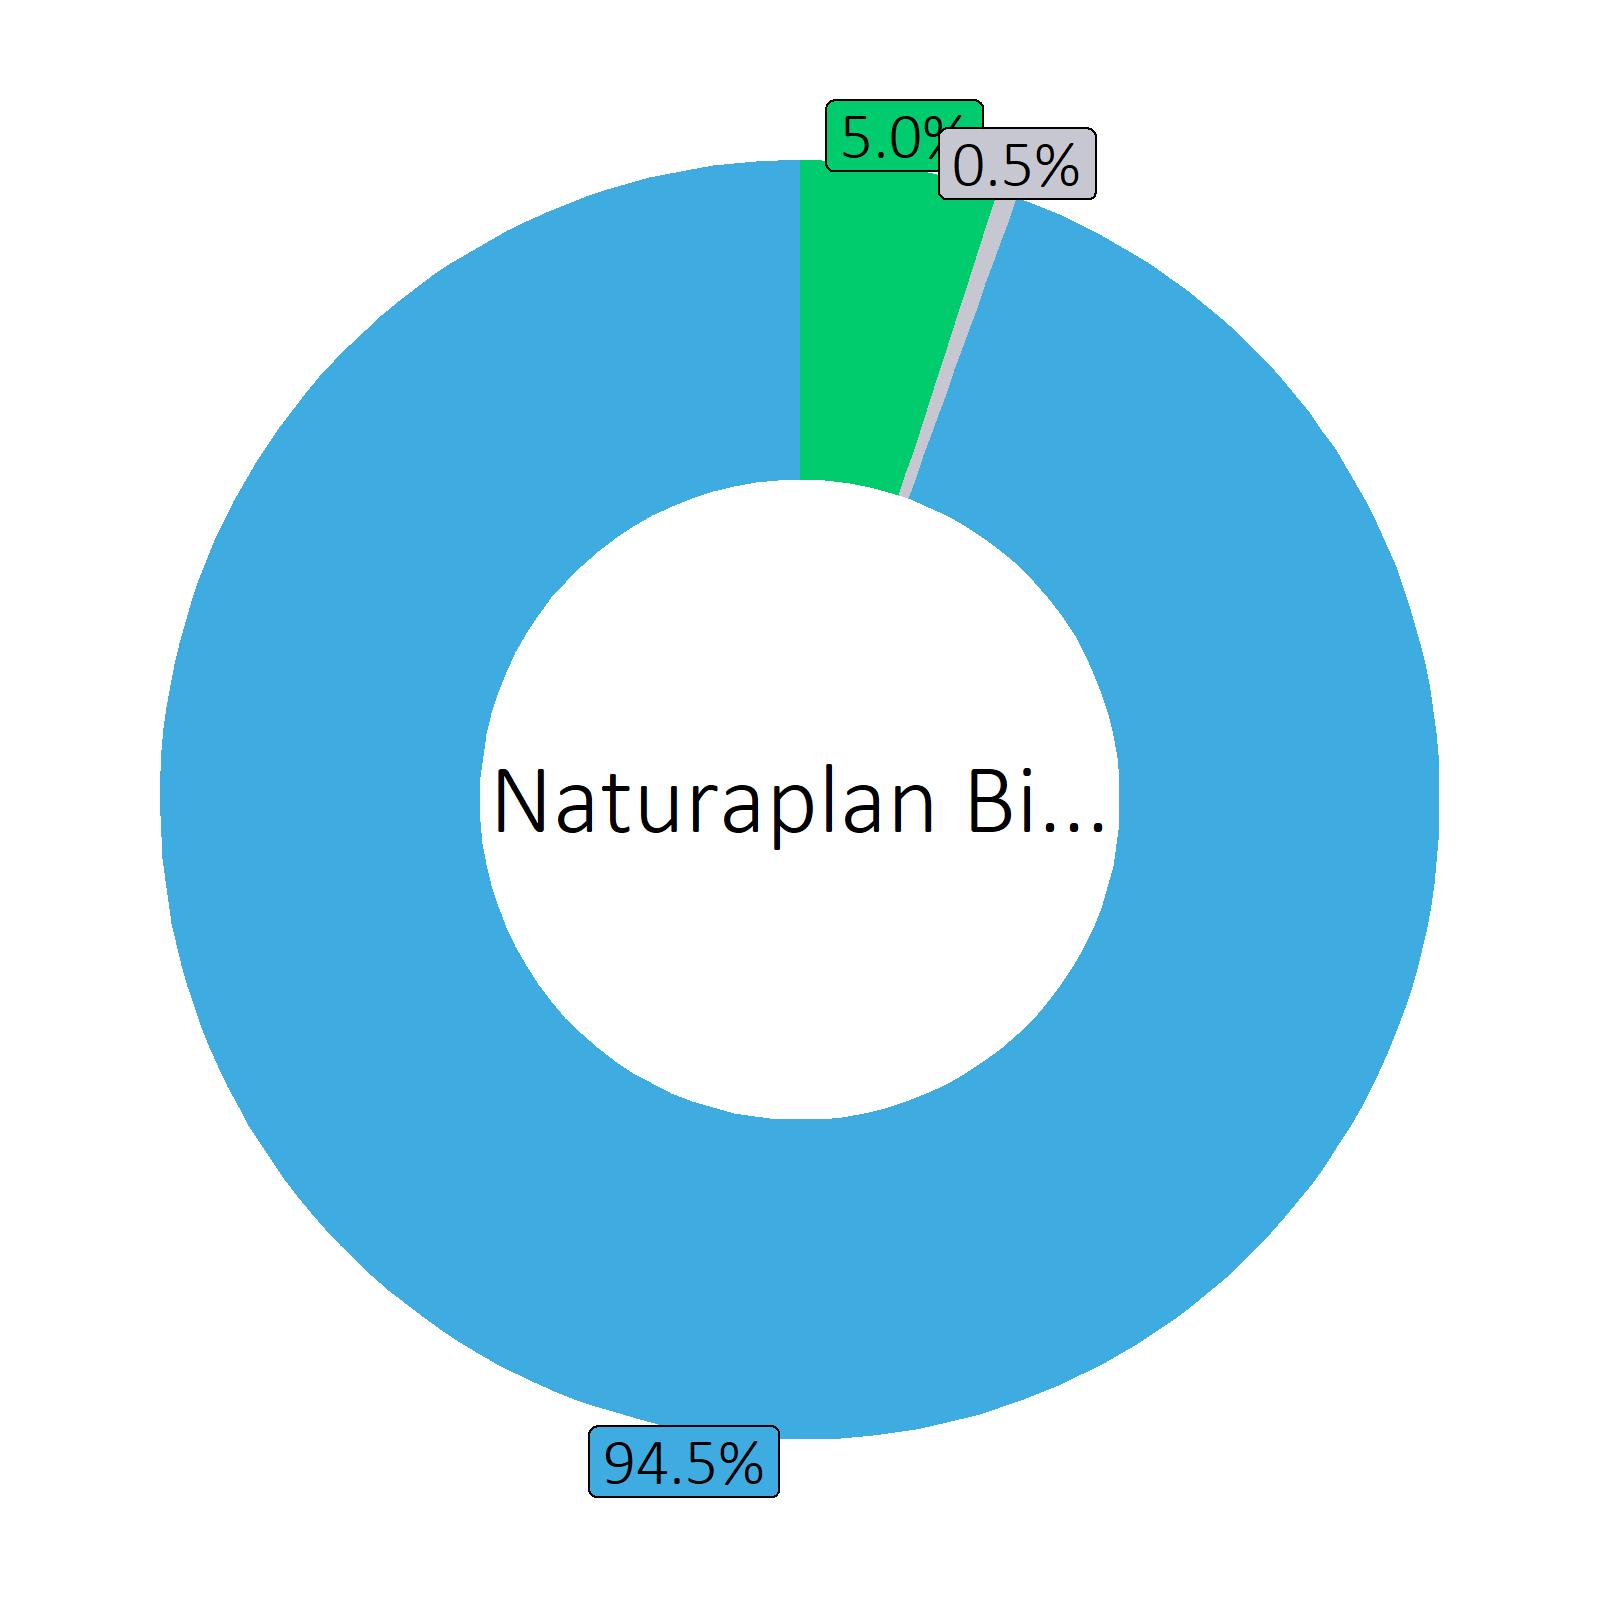 Bestandteile Naturaplan Bio Bier naturtrüb alkoholfrei 0.5 vol% (Coop)